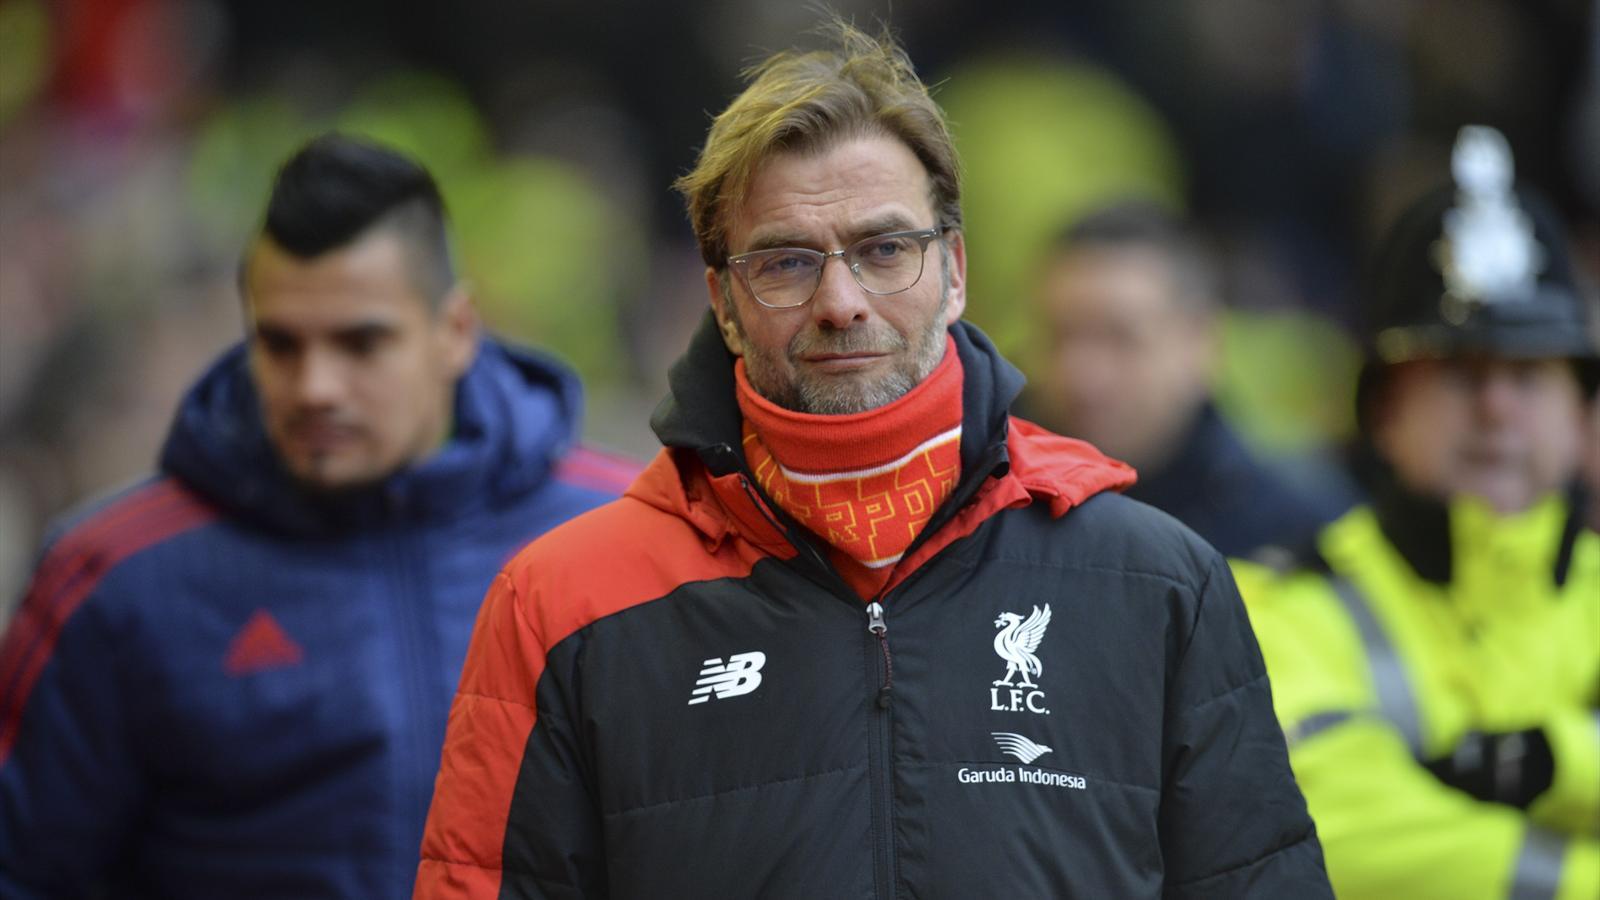 Liverpool's German manager Jurgen Klopp arrives